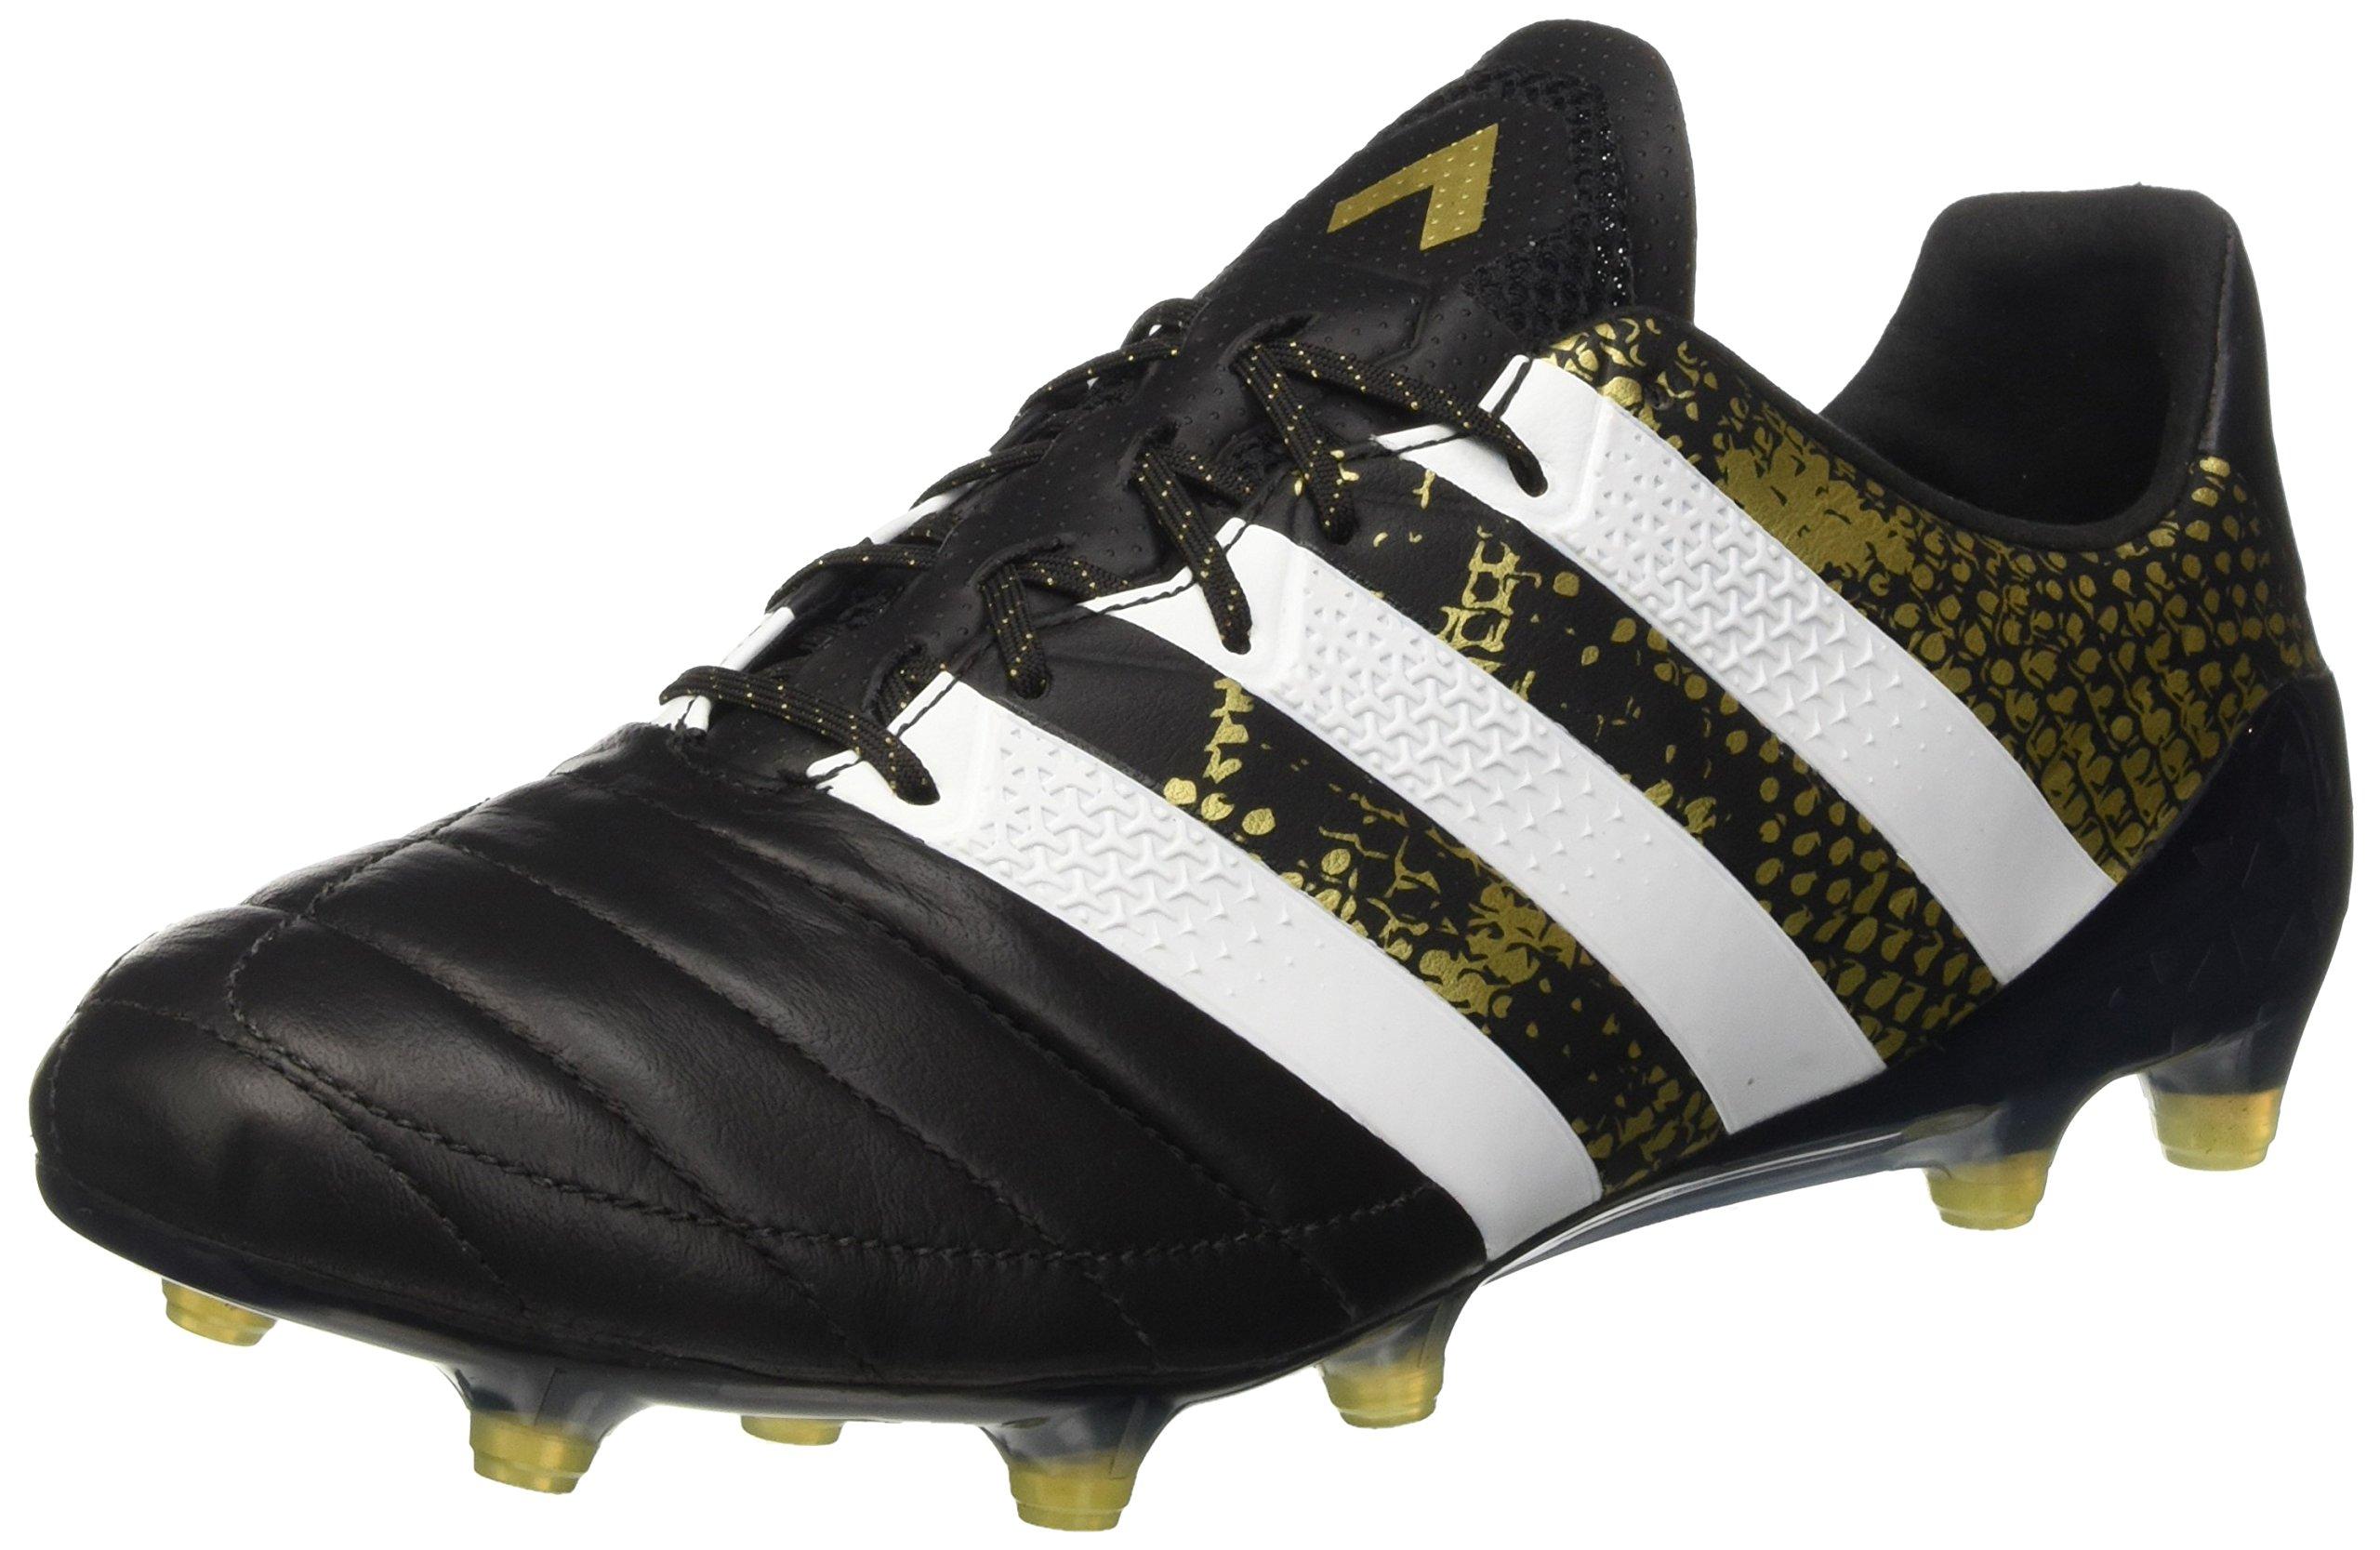 best service 582e5 8fc10 ... x17.1 FG AG Leather Pyro Storm Pack S82307 39 40 41 42 43 44 45 46 47  Camshaft. adidas Herren X 17.1 Fg Fußballschuhe. adidas Football Boots for  Mens